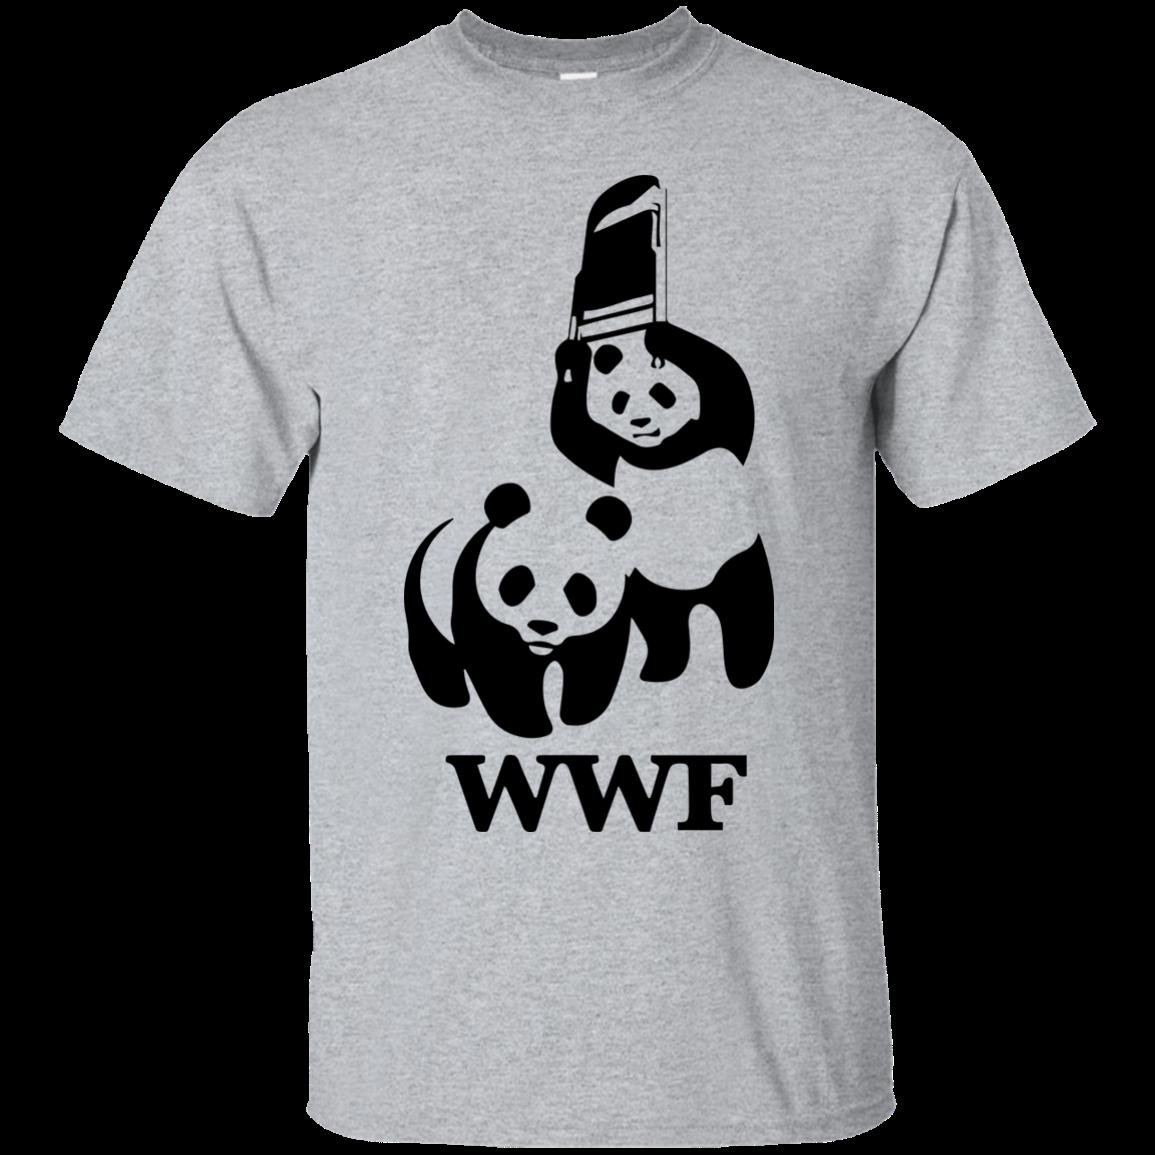 wwf panda bear wrestling t shirts. Black Bedroom Furniture Sets. Home Design Ideas